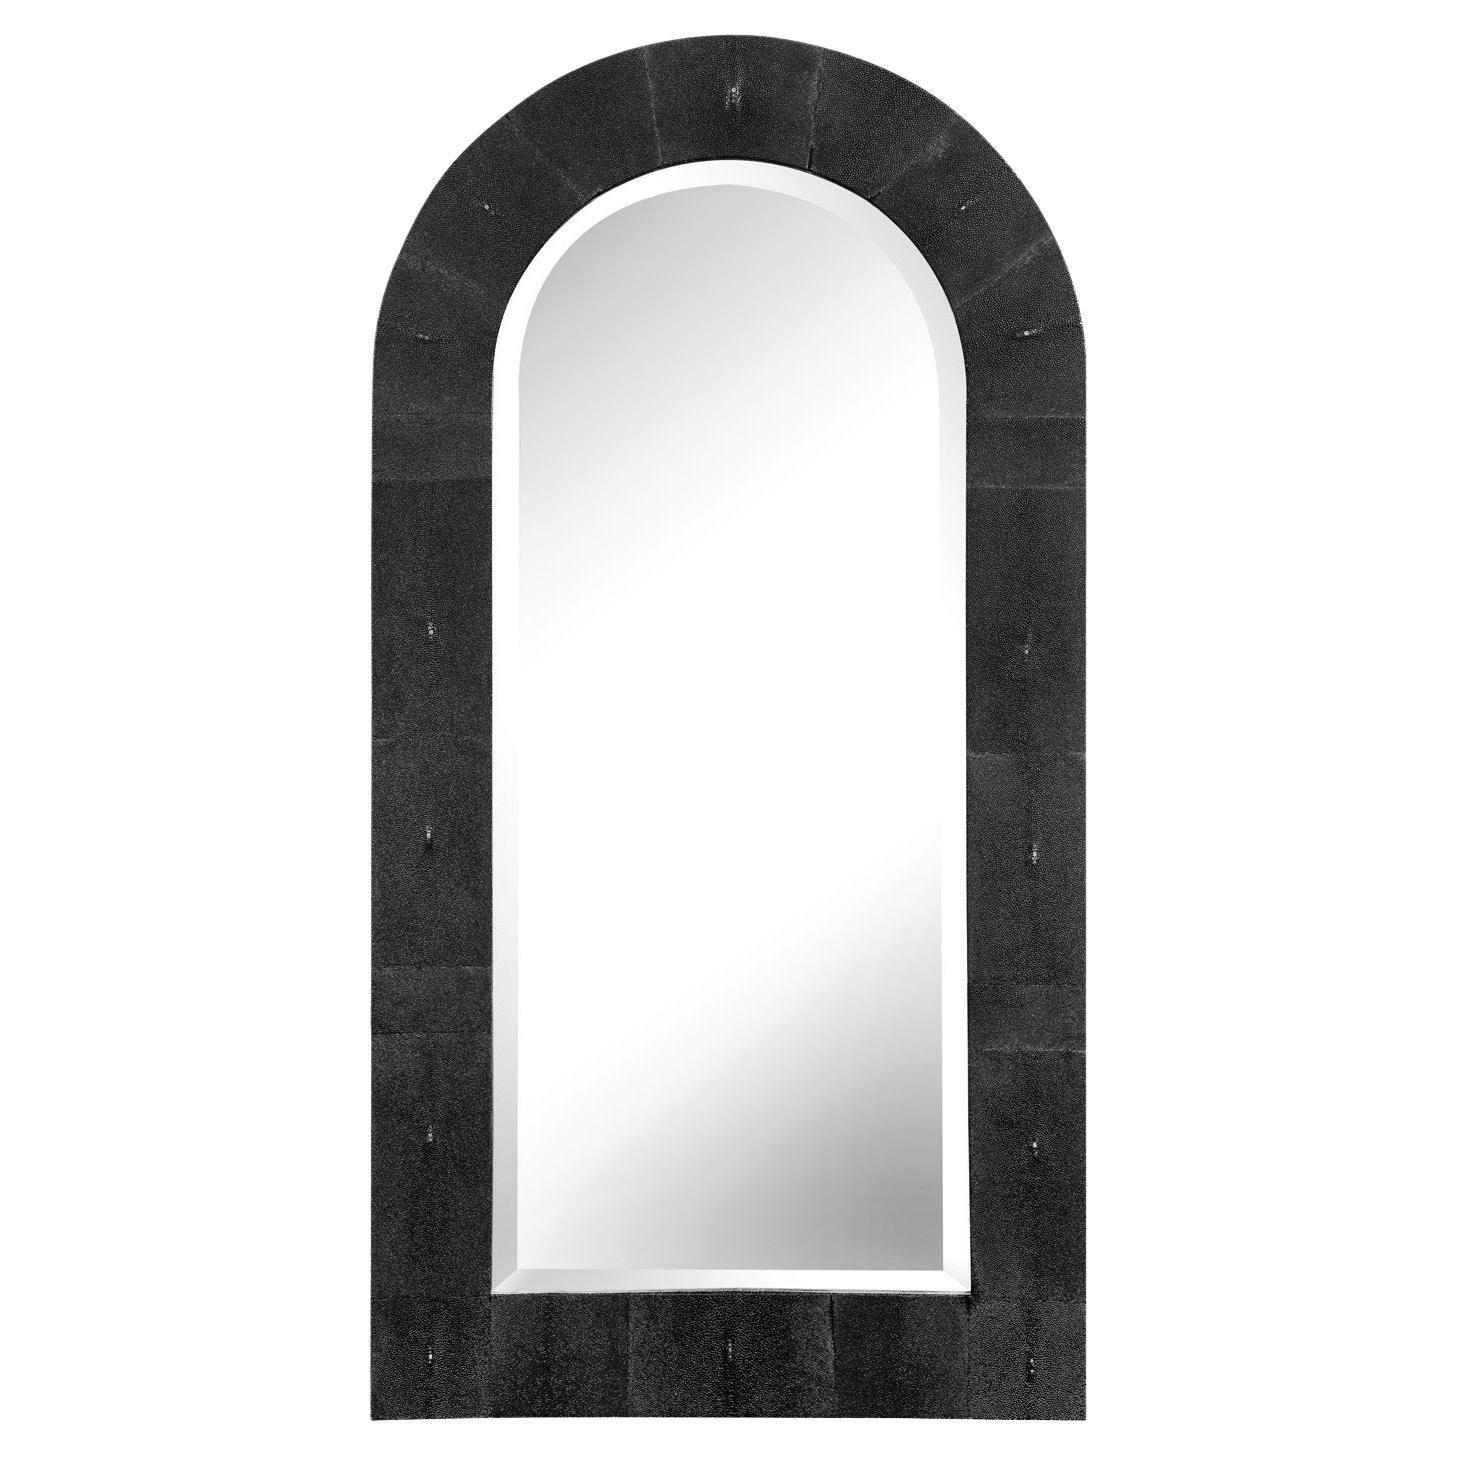 "Karl Springer ""Dome Top Mirror"" in Black Shagreen 1980s 'Signed'"